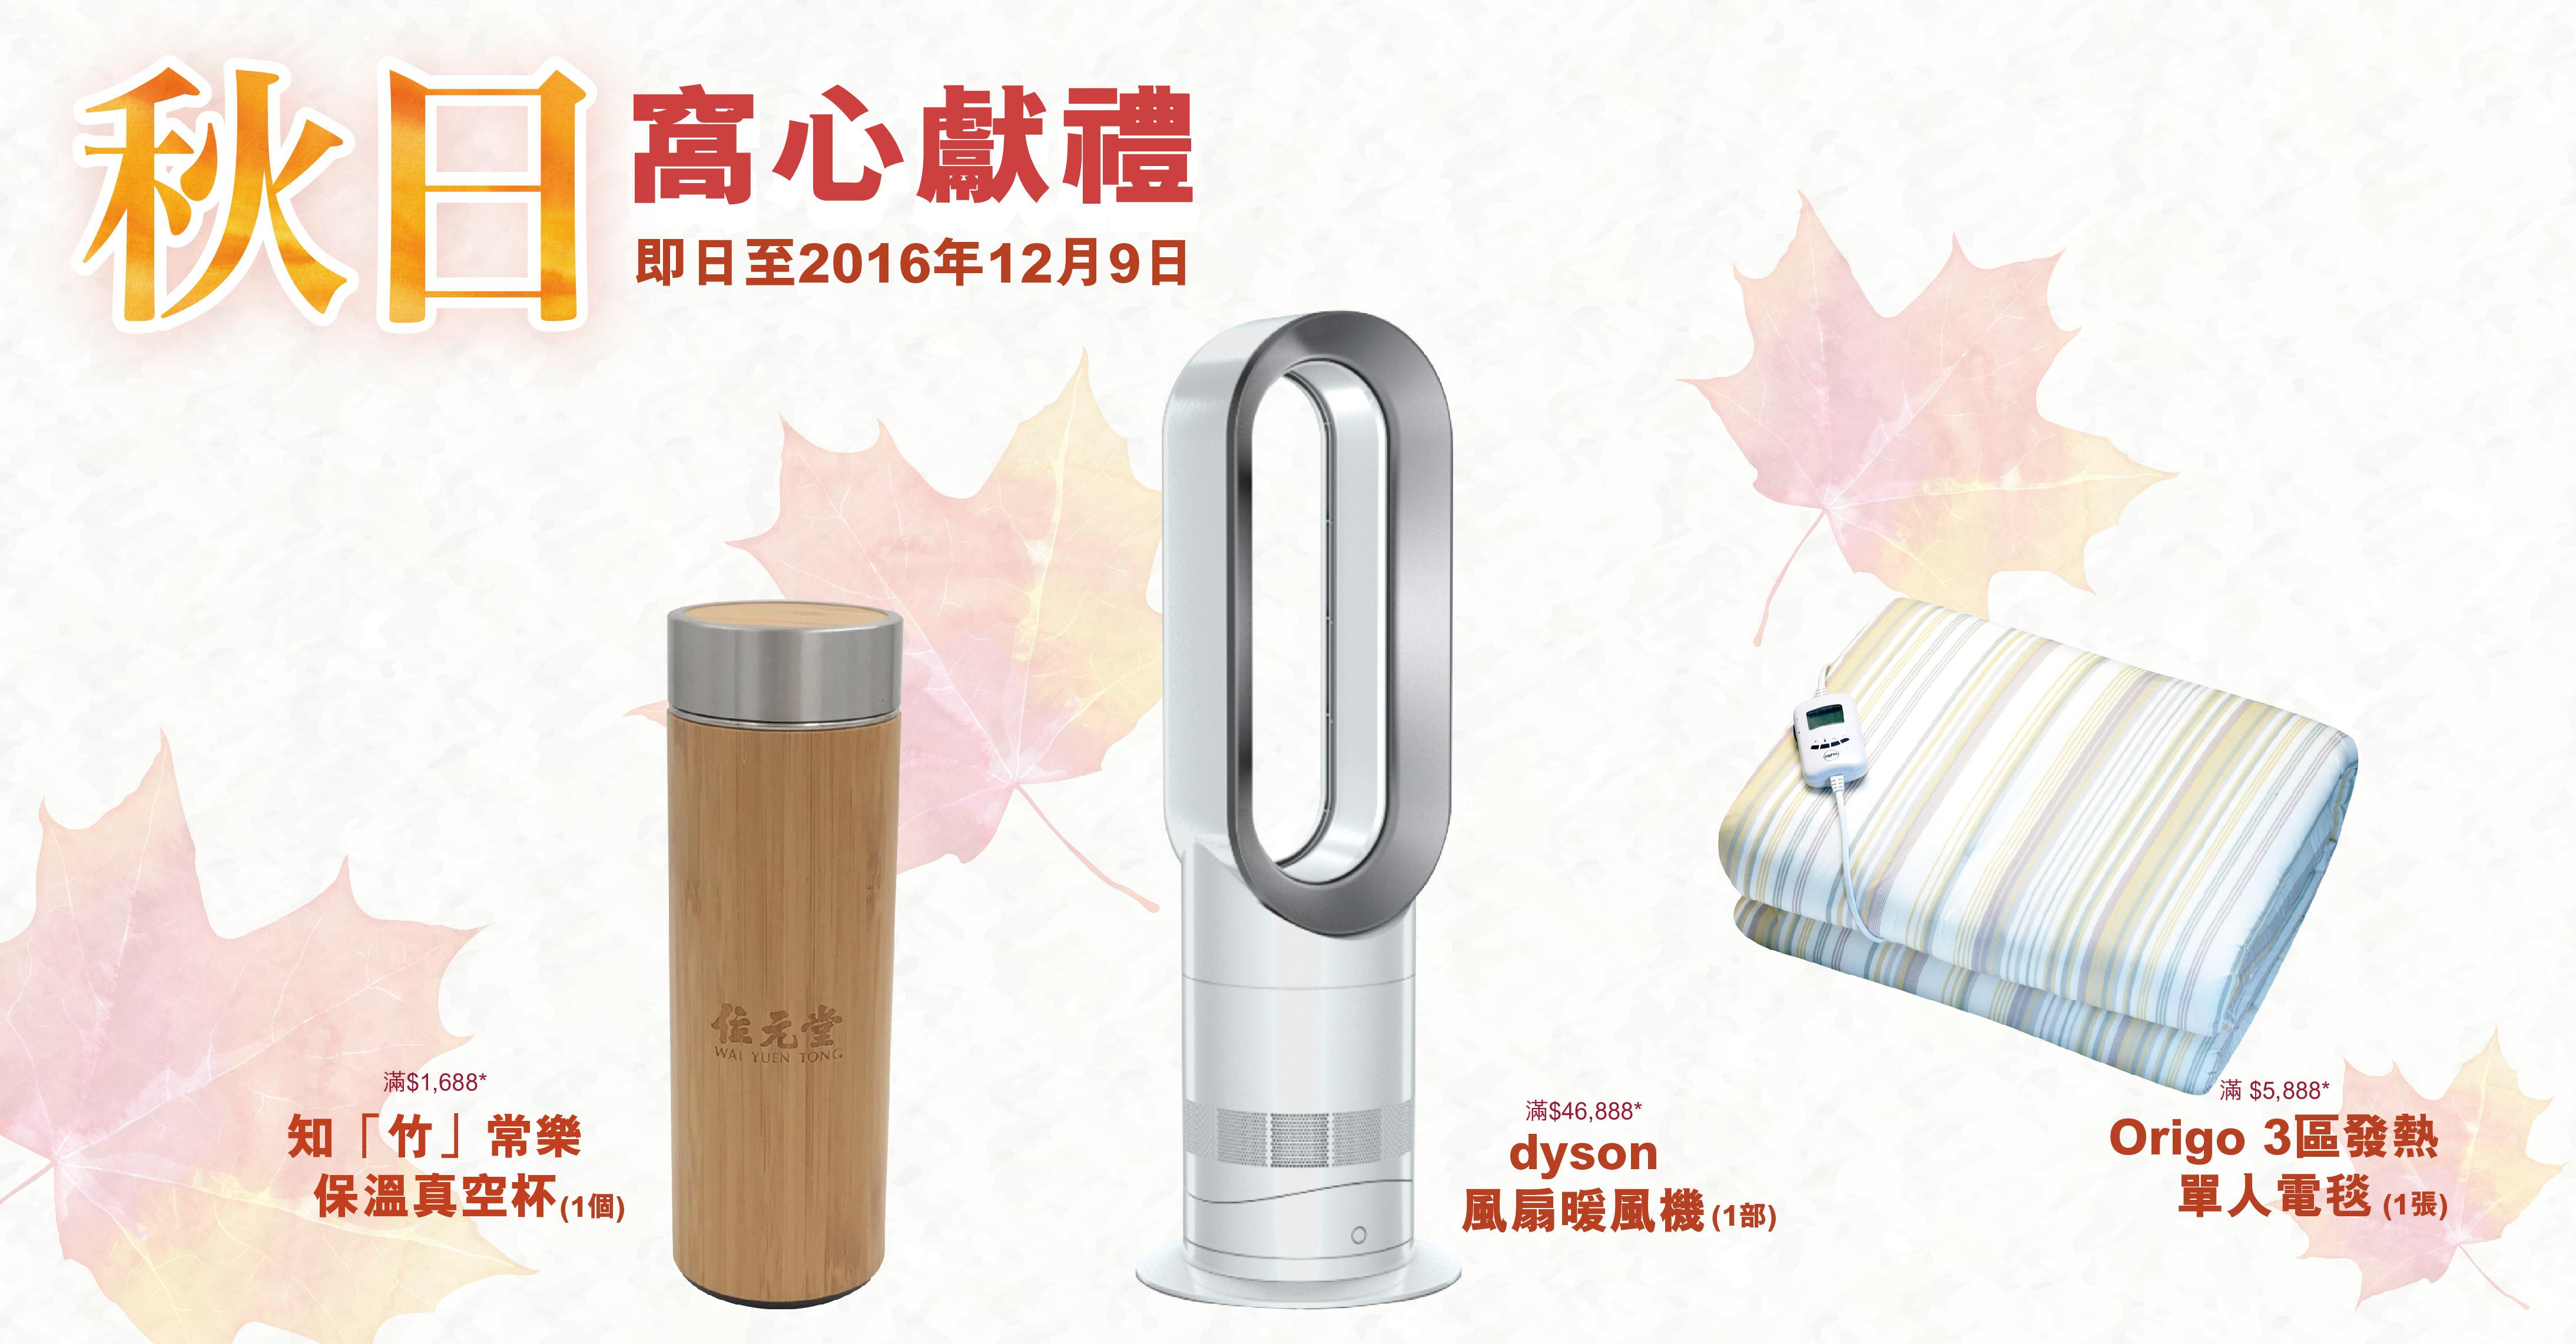 <!--:en-->Autumn Winter Promo<!--:--><!--:cn-->秋日窝心献礼<!--:--><!--:hk-->秋日窩心獻禮<!--:-->